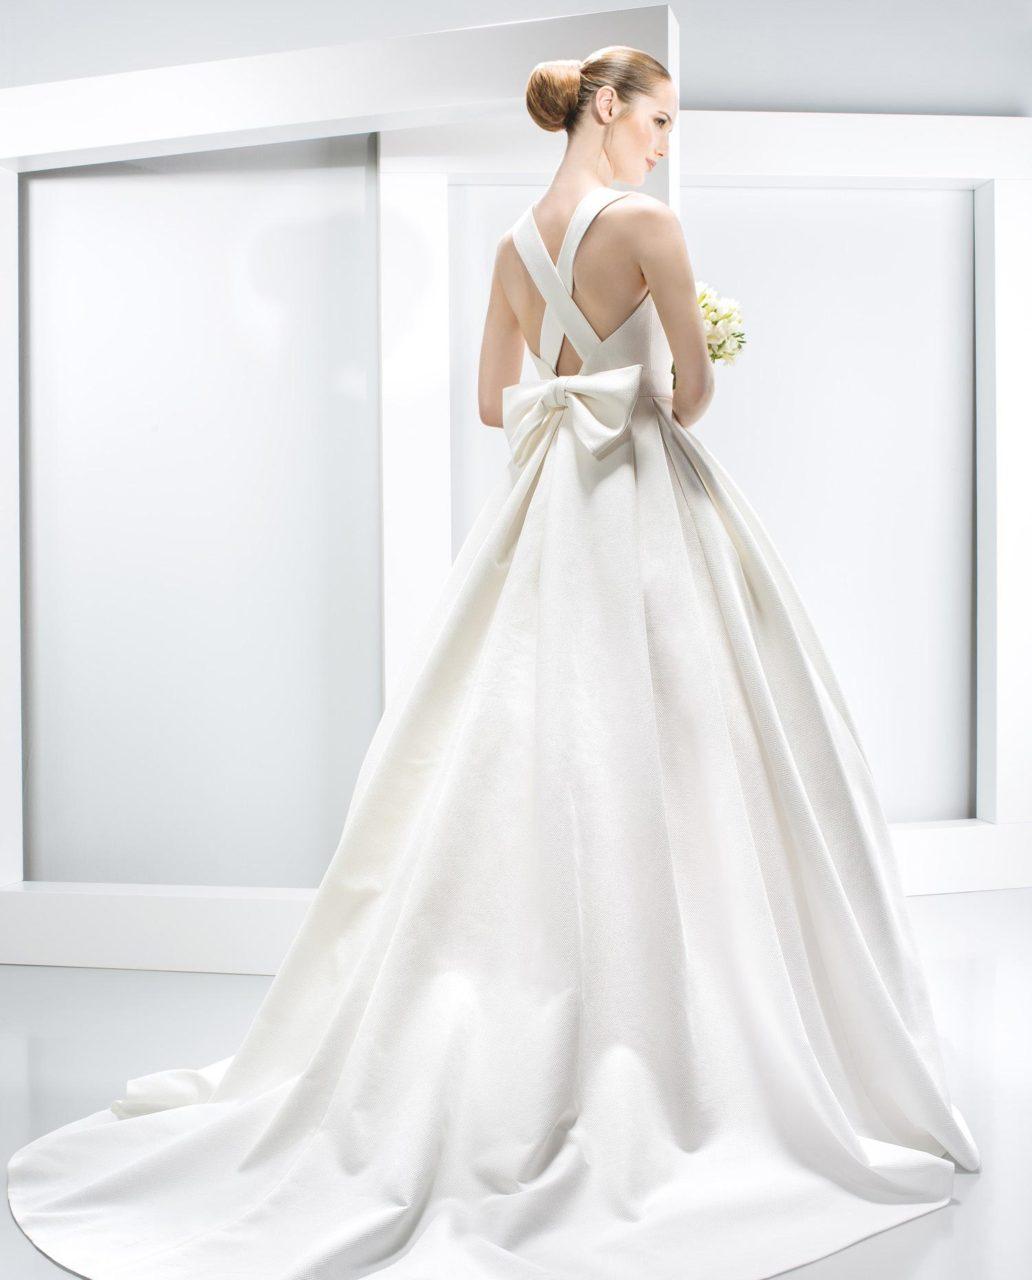 Winter Wedding Dresses for 2016